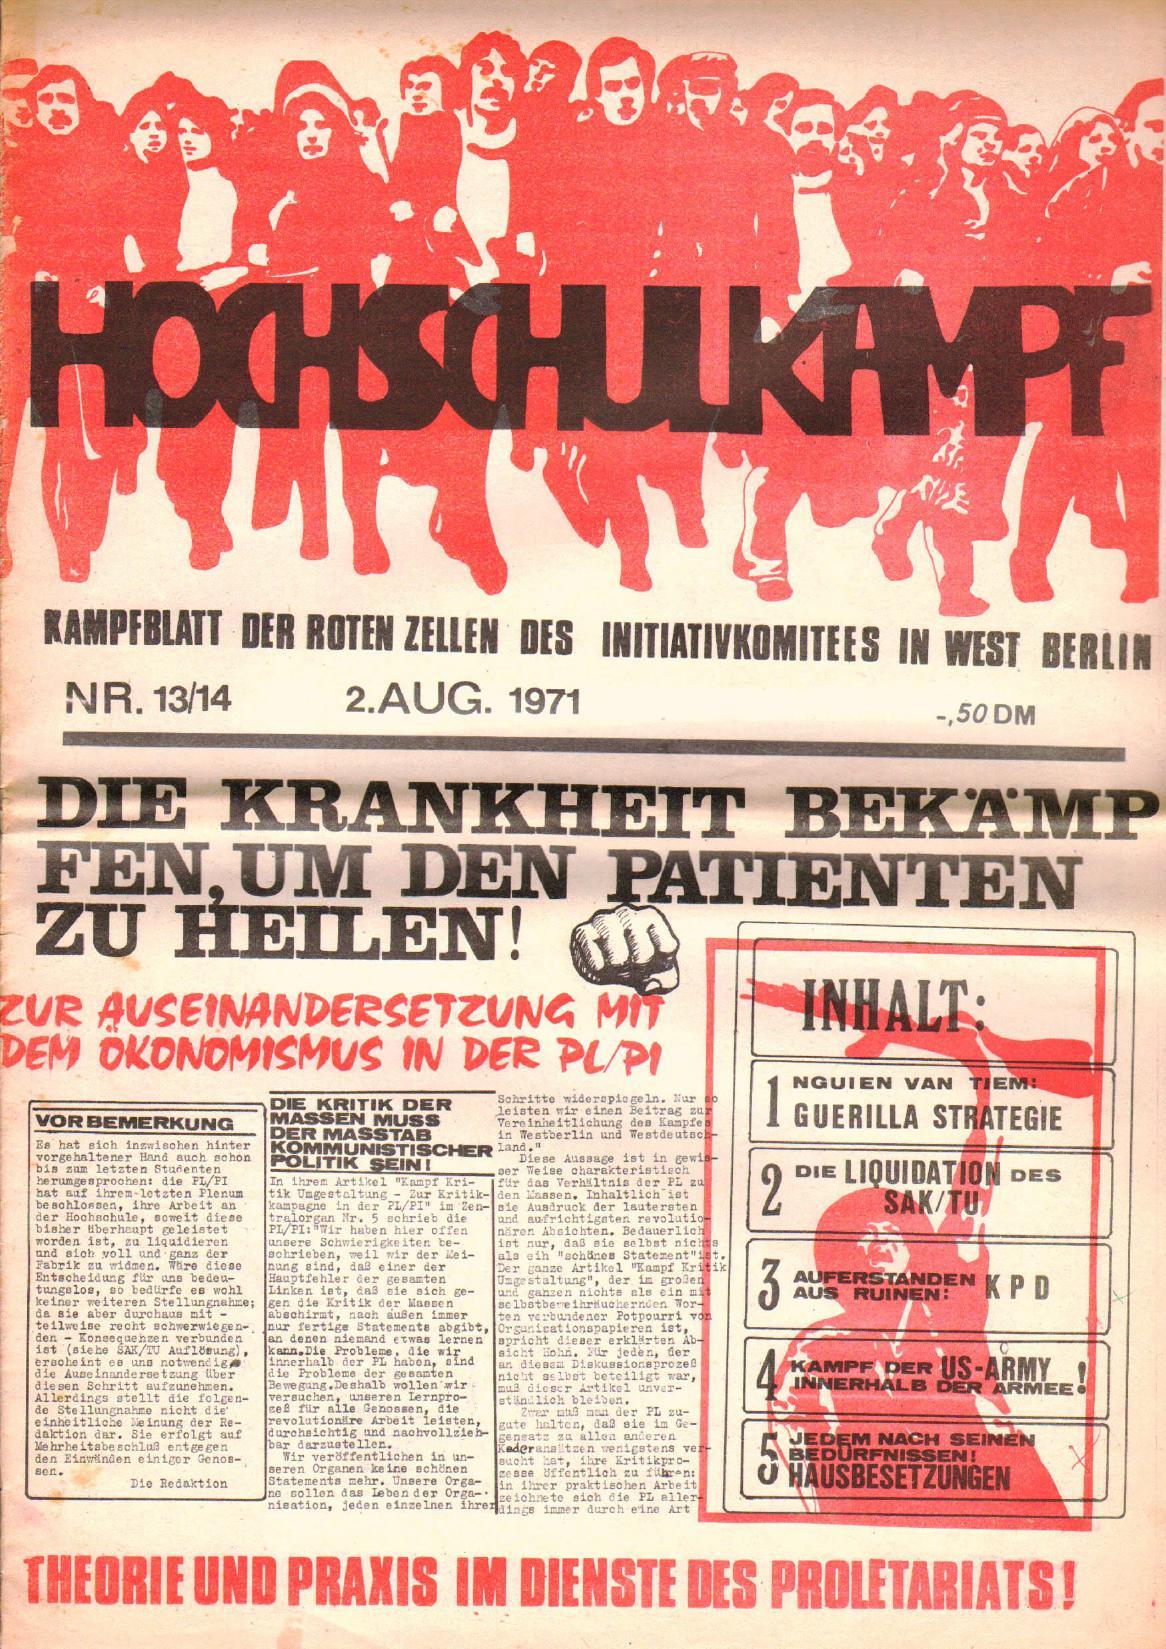 Berlin_Hochschulkampf_1971_13_01